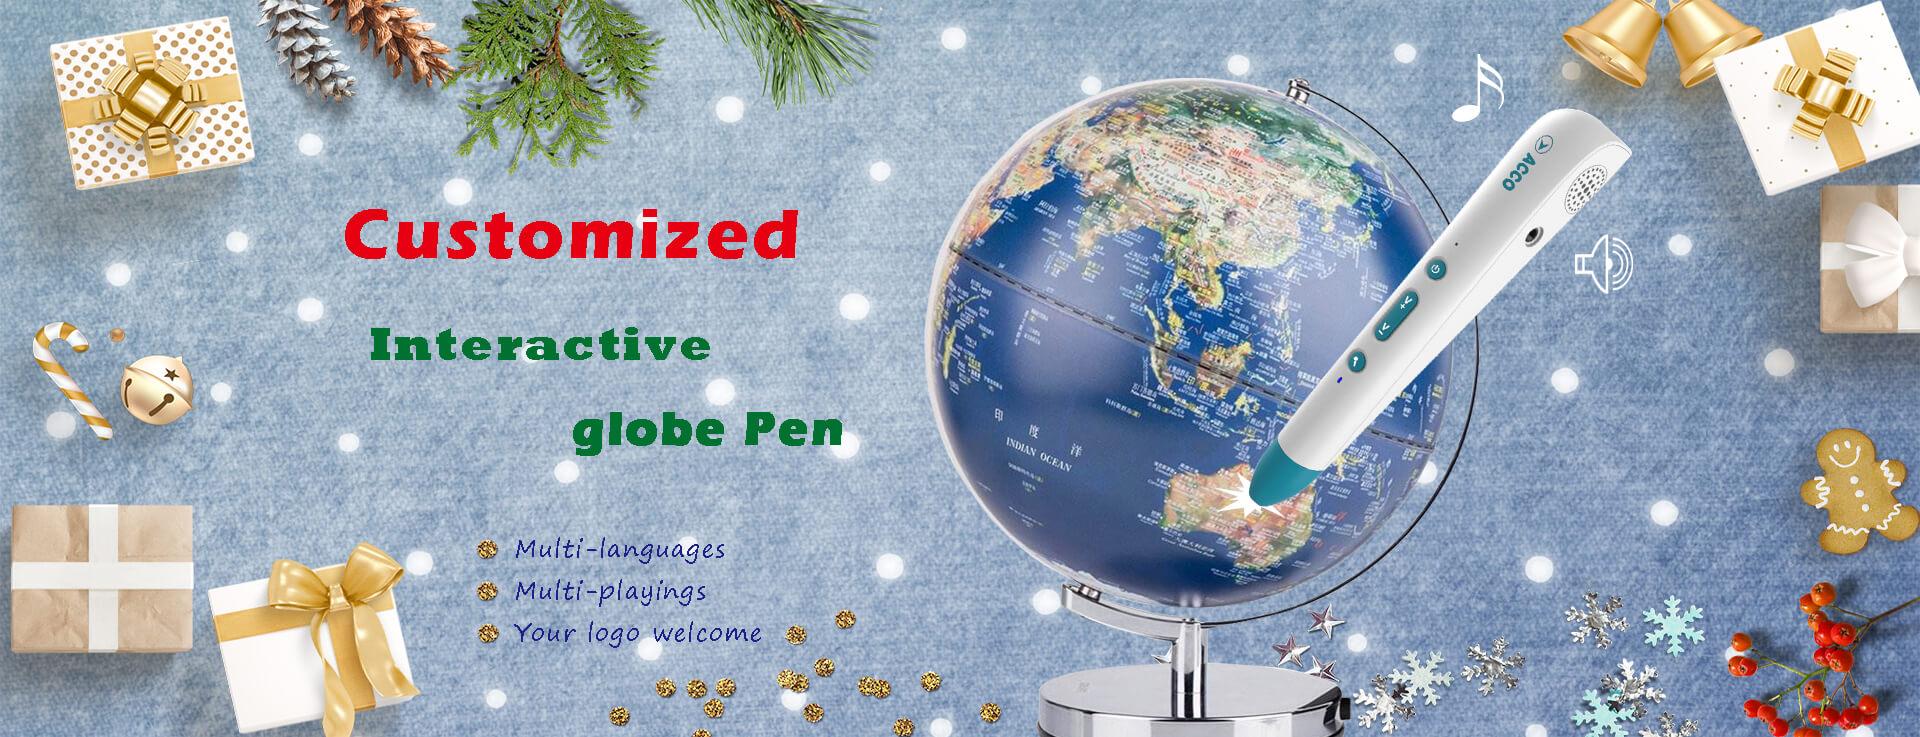 interactive globe pen